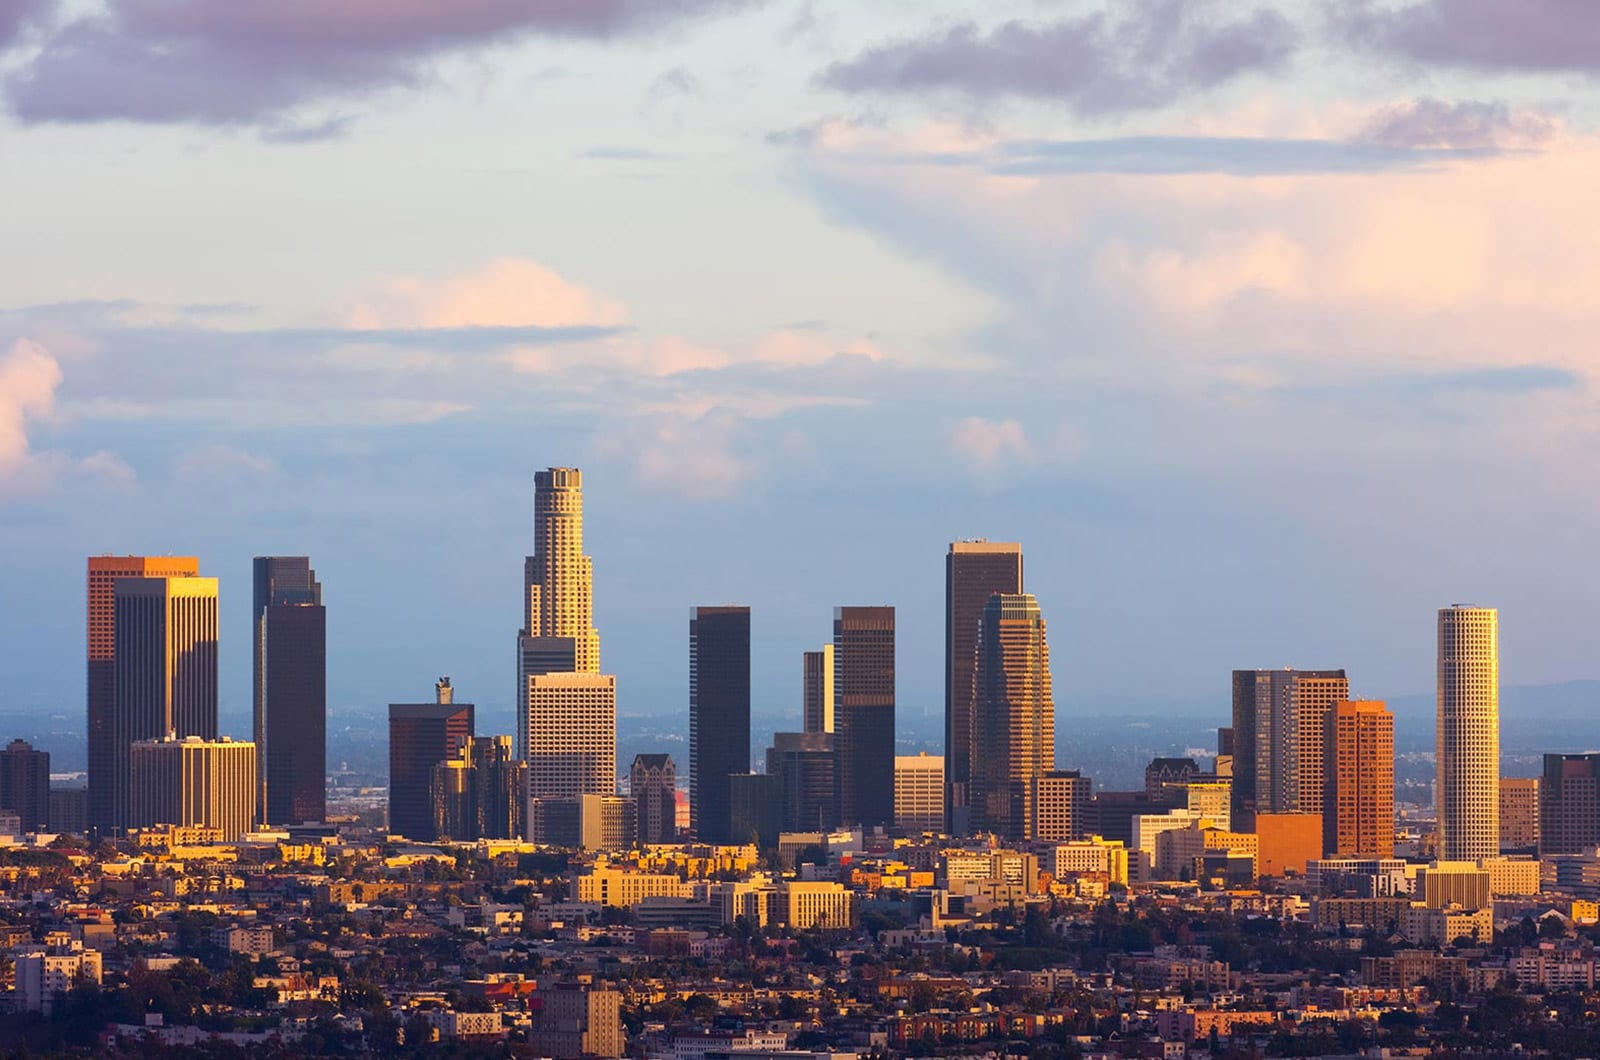 Featured Image Los Angeles   Los Angeles Virtual Tour Photographer   Los Angeles 360 Photography Services   Los Angeles HDR Real Estate Photographer   Los Angeles Matterport 3D Tour Service Provider